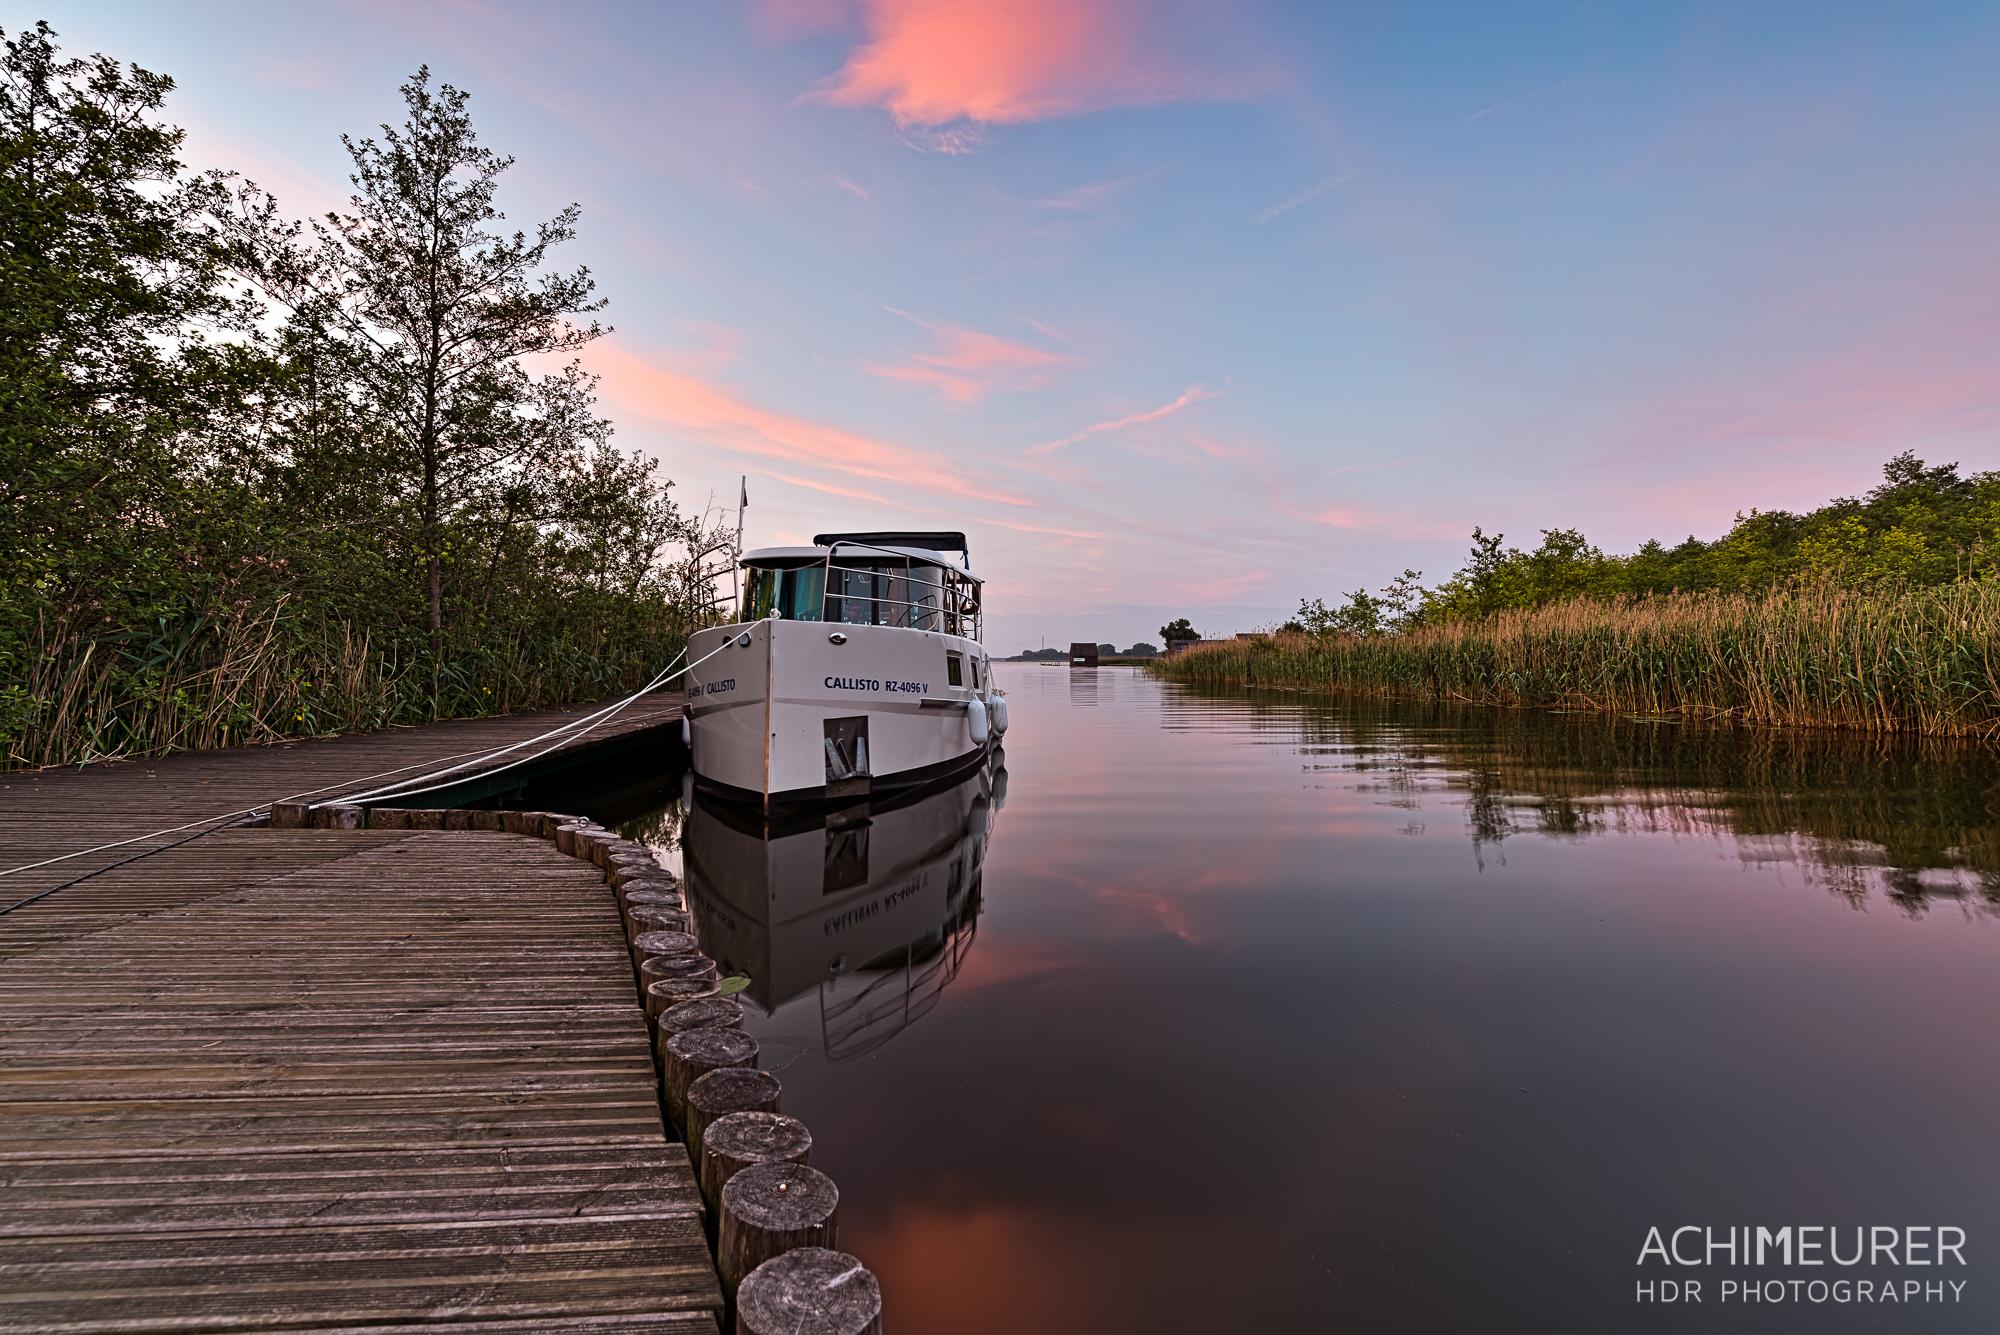 Hausboot-Kuhnle-Mueritz-Mecklenburg-Vorpommern-See_2924_3_2_1_0_HDR-Bearbeitet